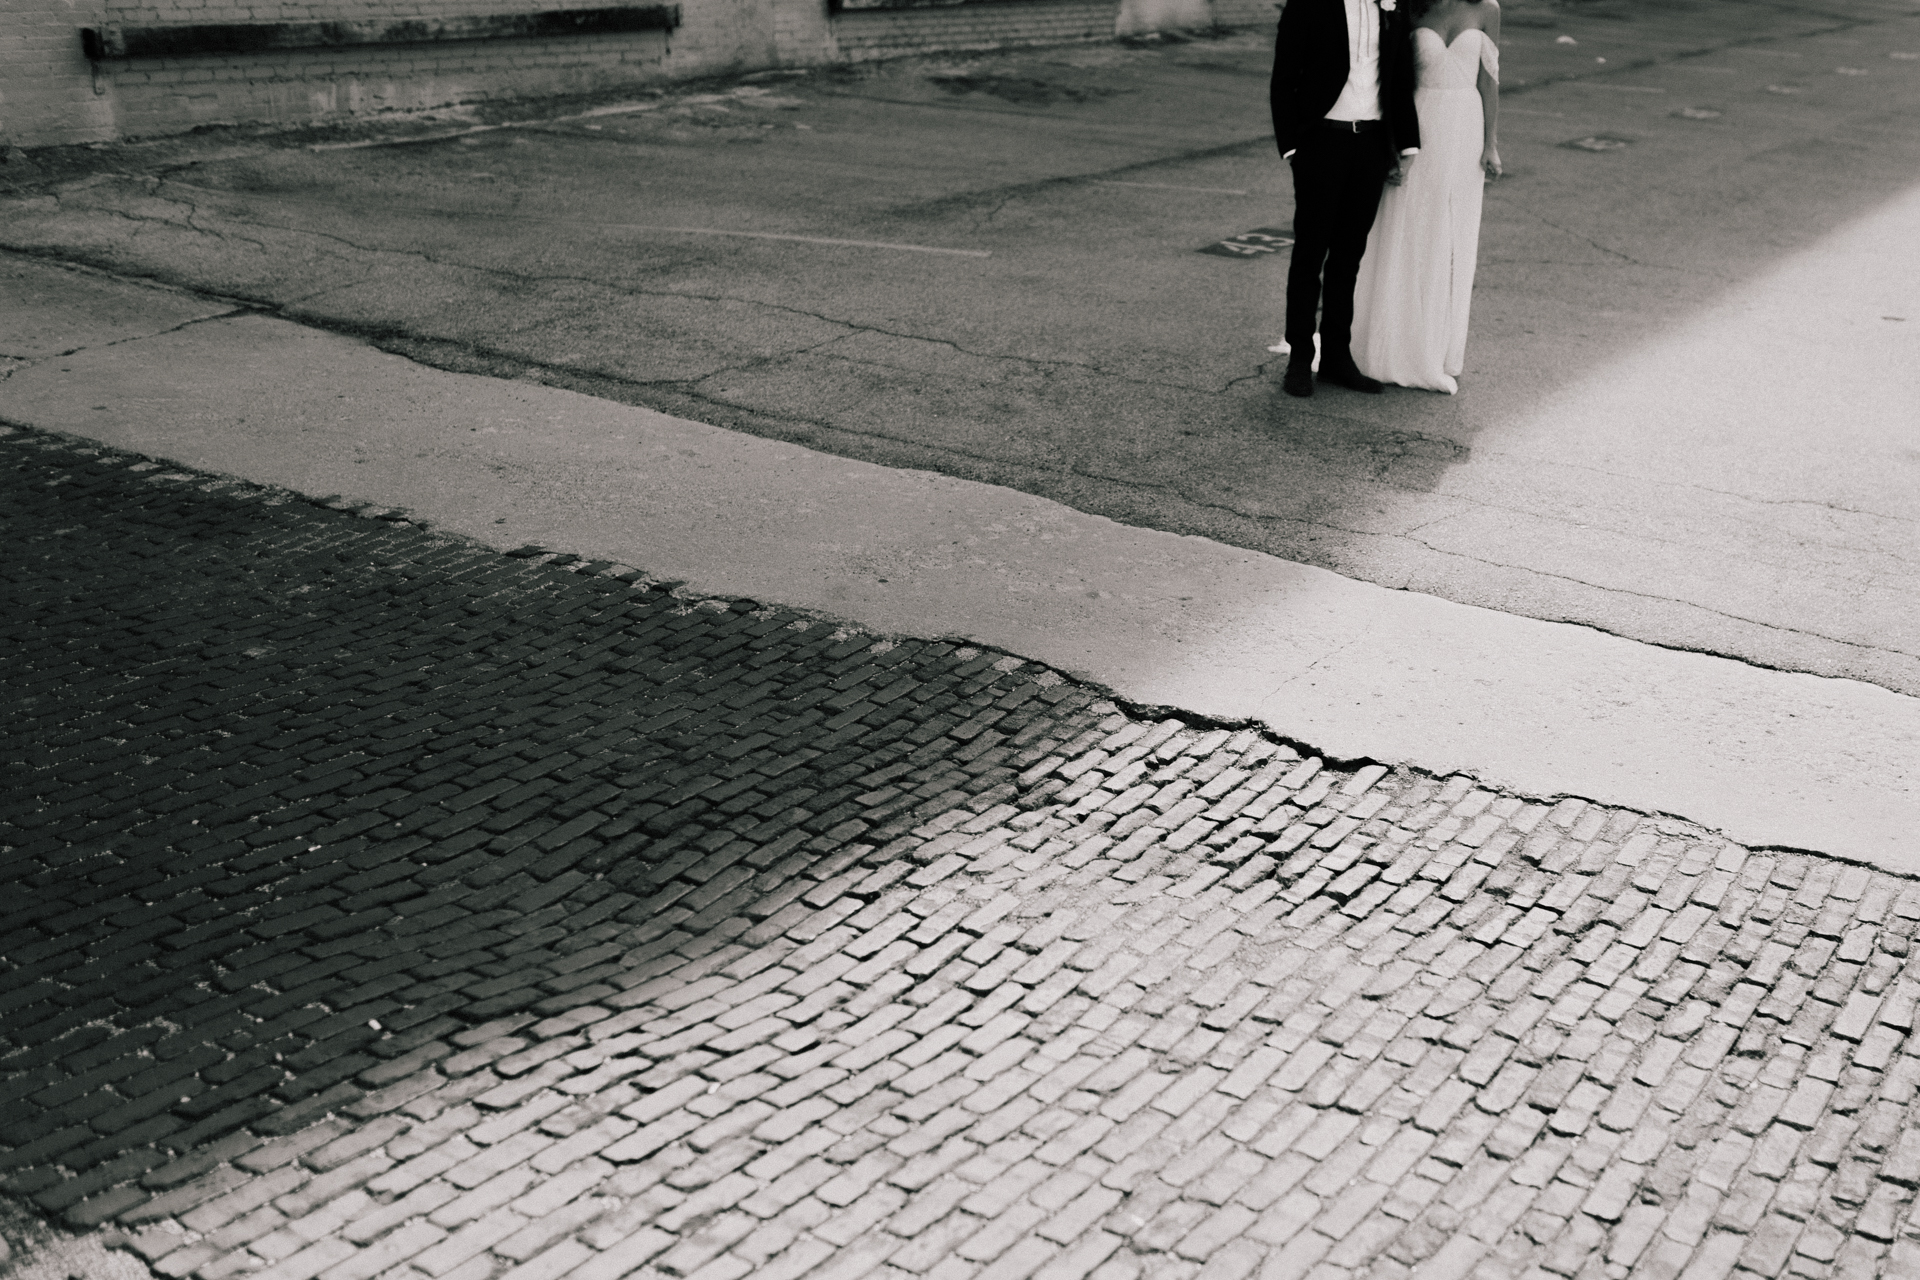 thrive-modern-photography-workshop-tulsa-oklahoma-1005.jpg